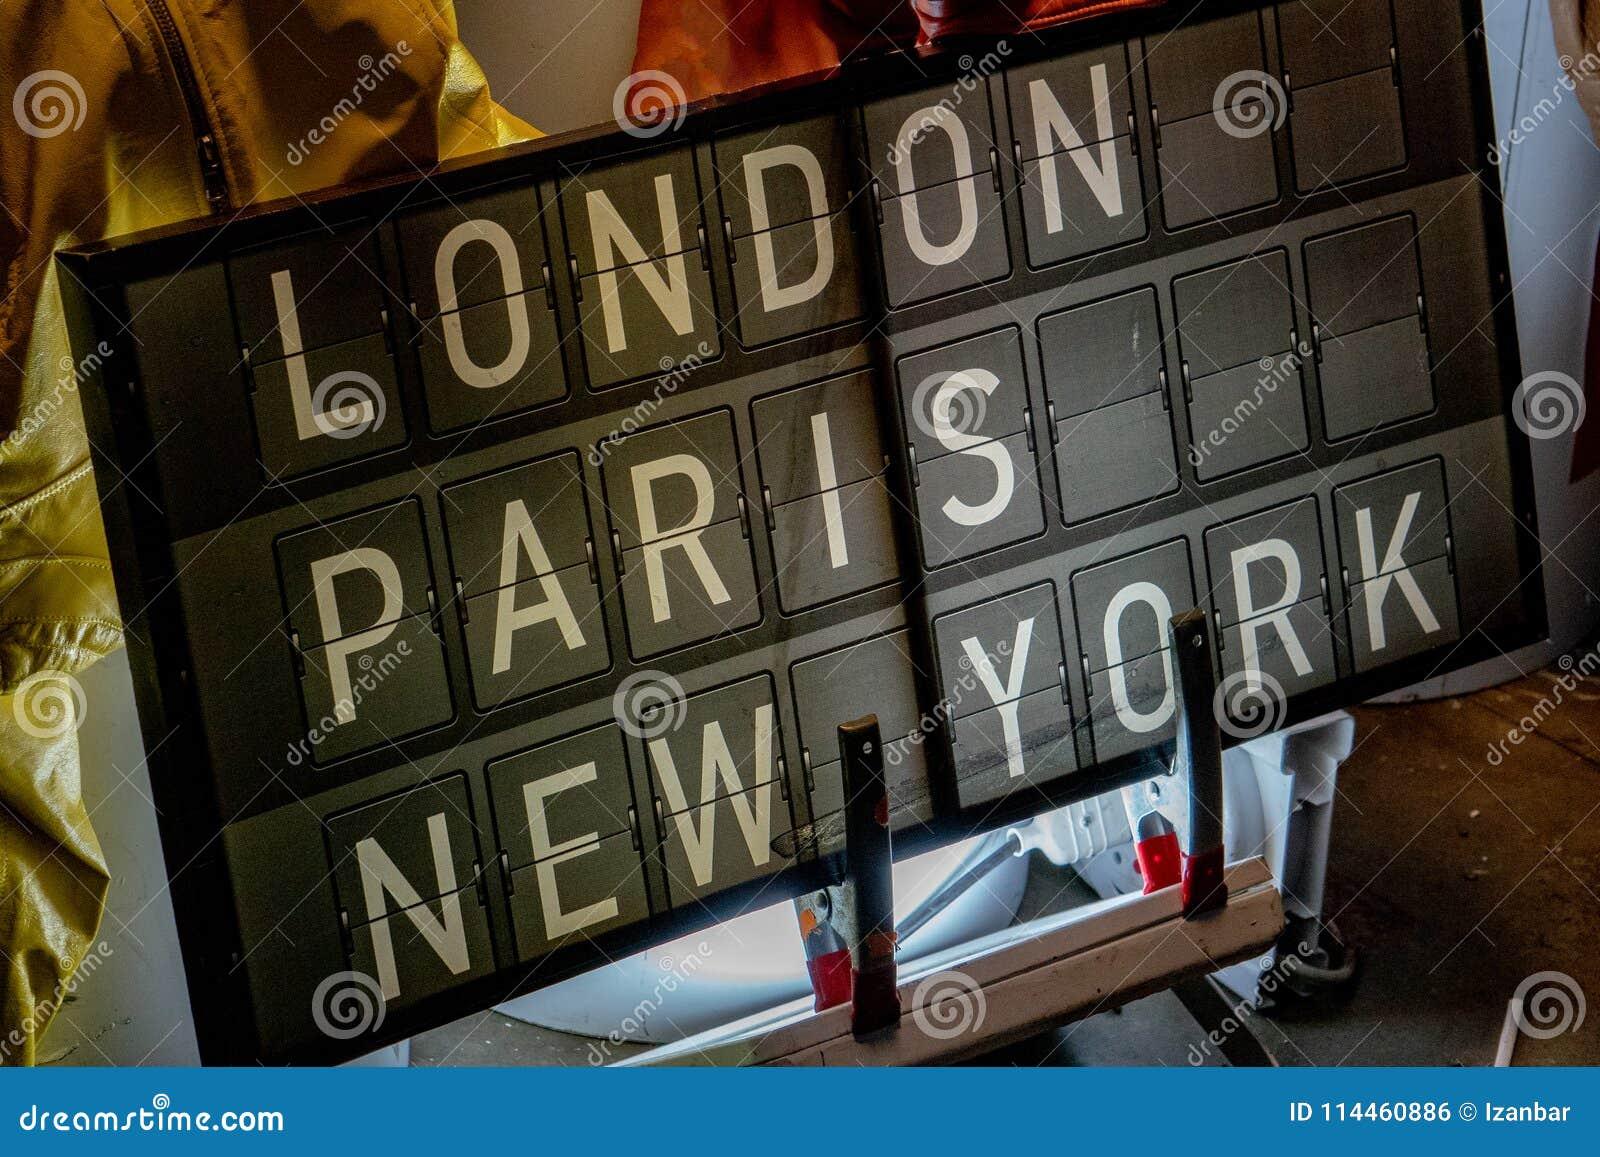 Aeroporto York : Painel do aeroporto de londres paris new york foto de stock imagem